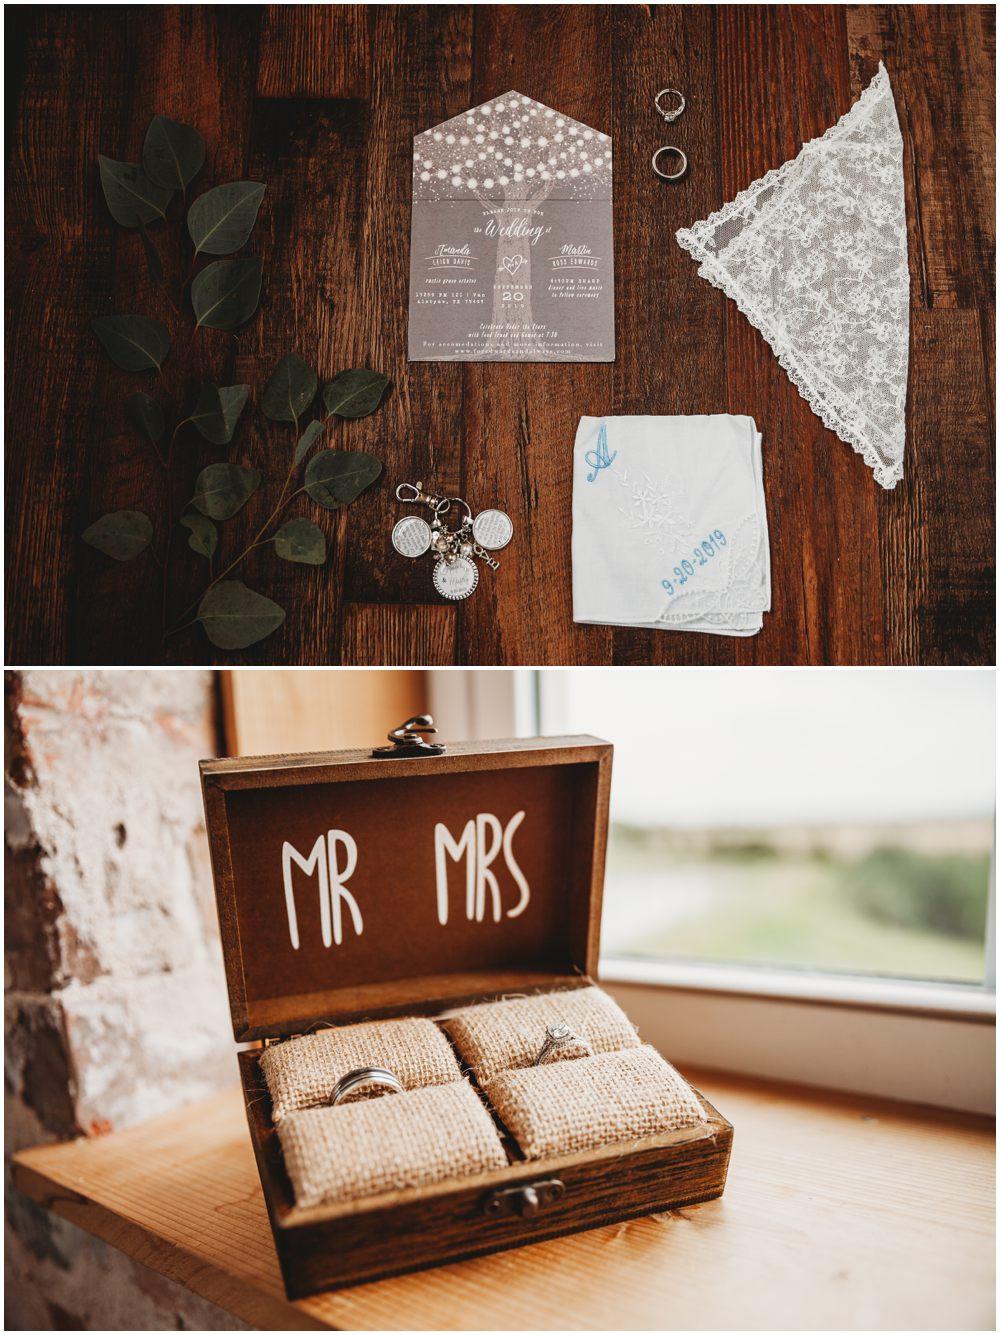 Wedding layflat ideas